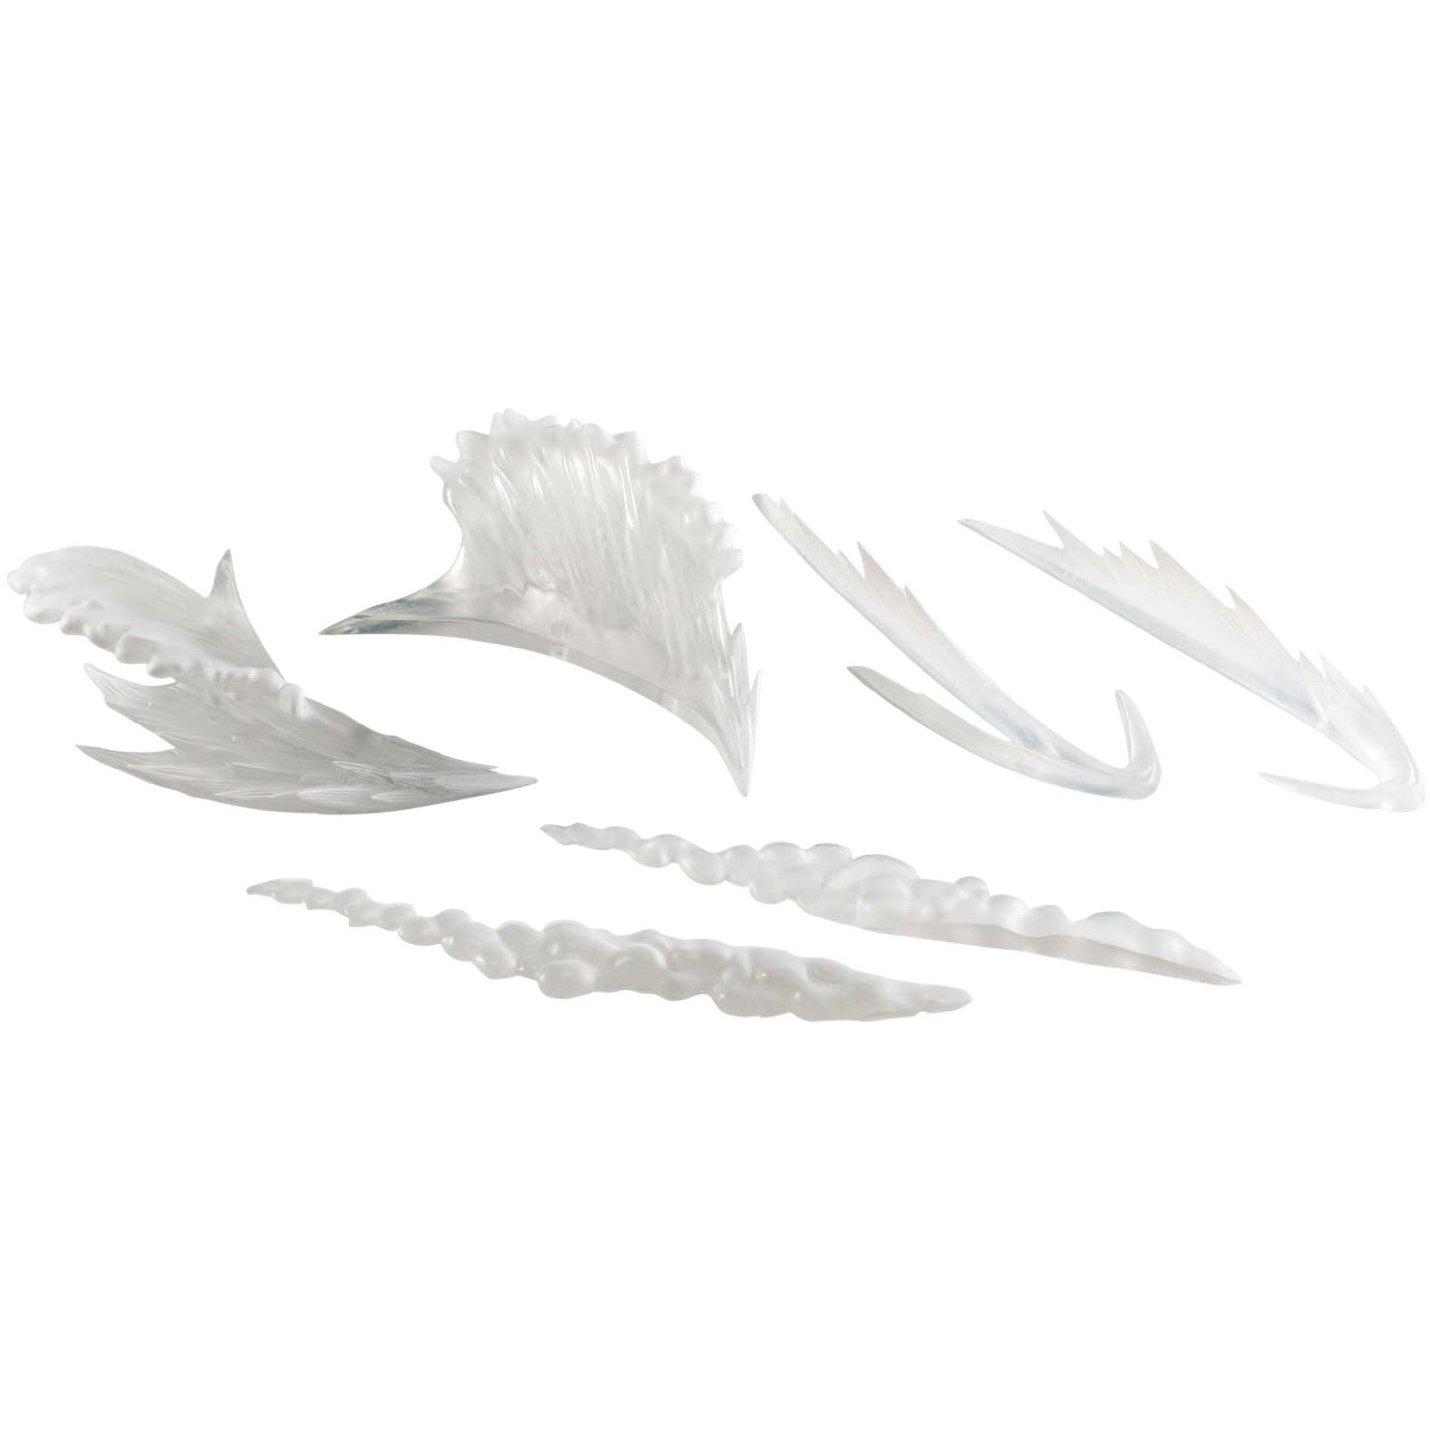 1 FREE Anime Themed Trading Card Bundle Bandai BCC948I82 Tamashii Nation Action Figure Effect Set Clear Wave Effect